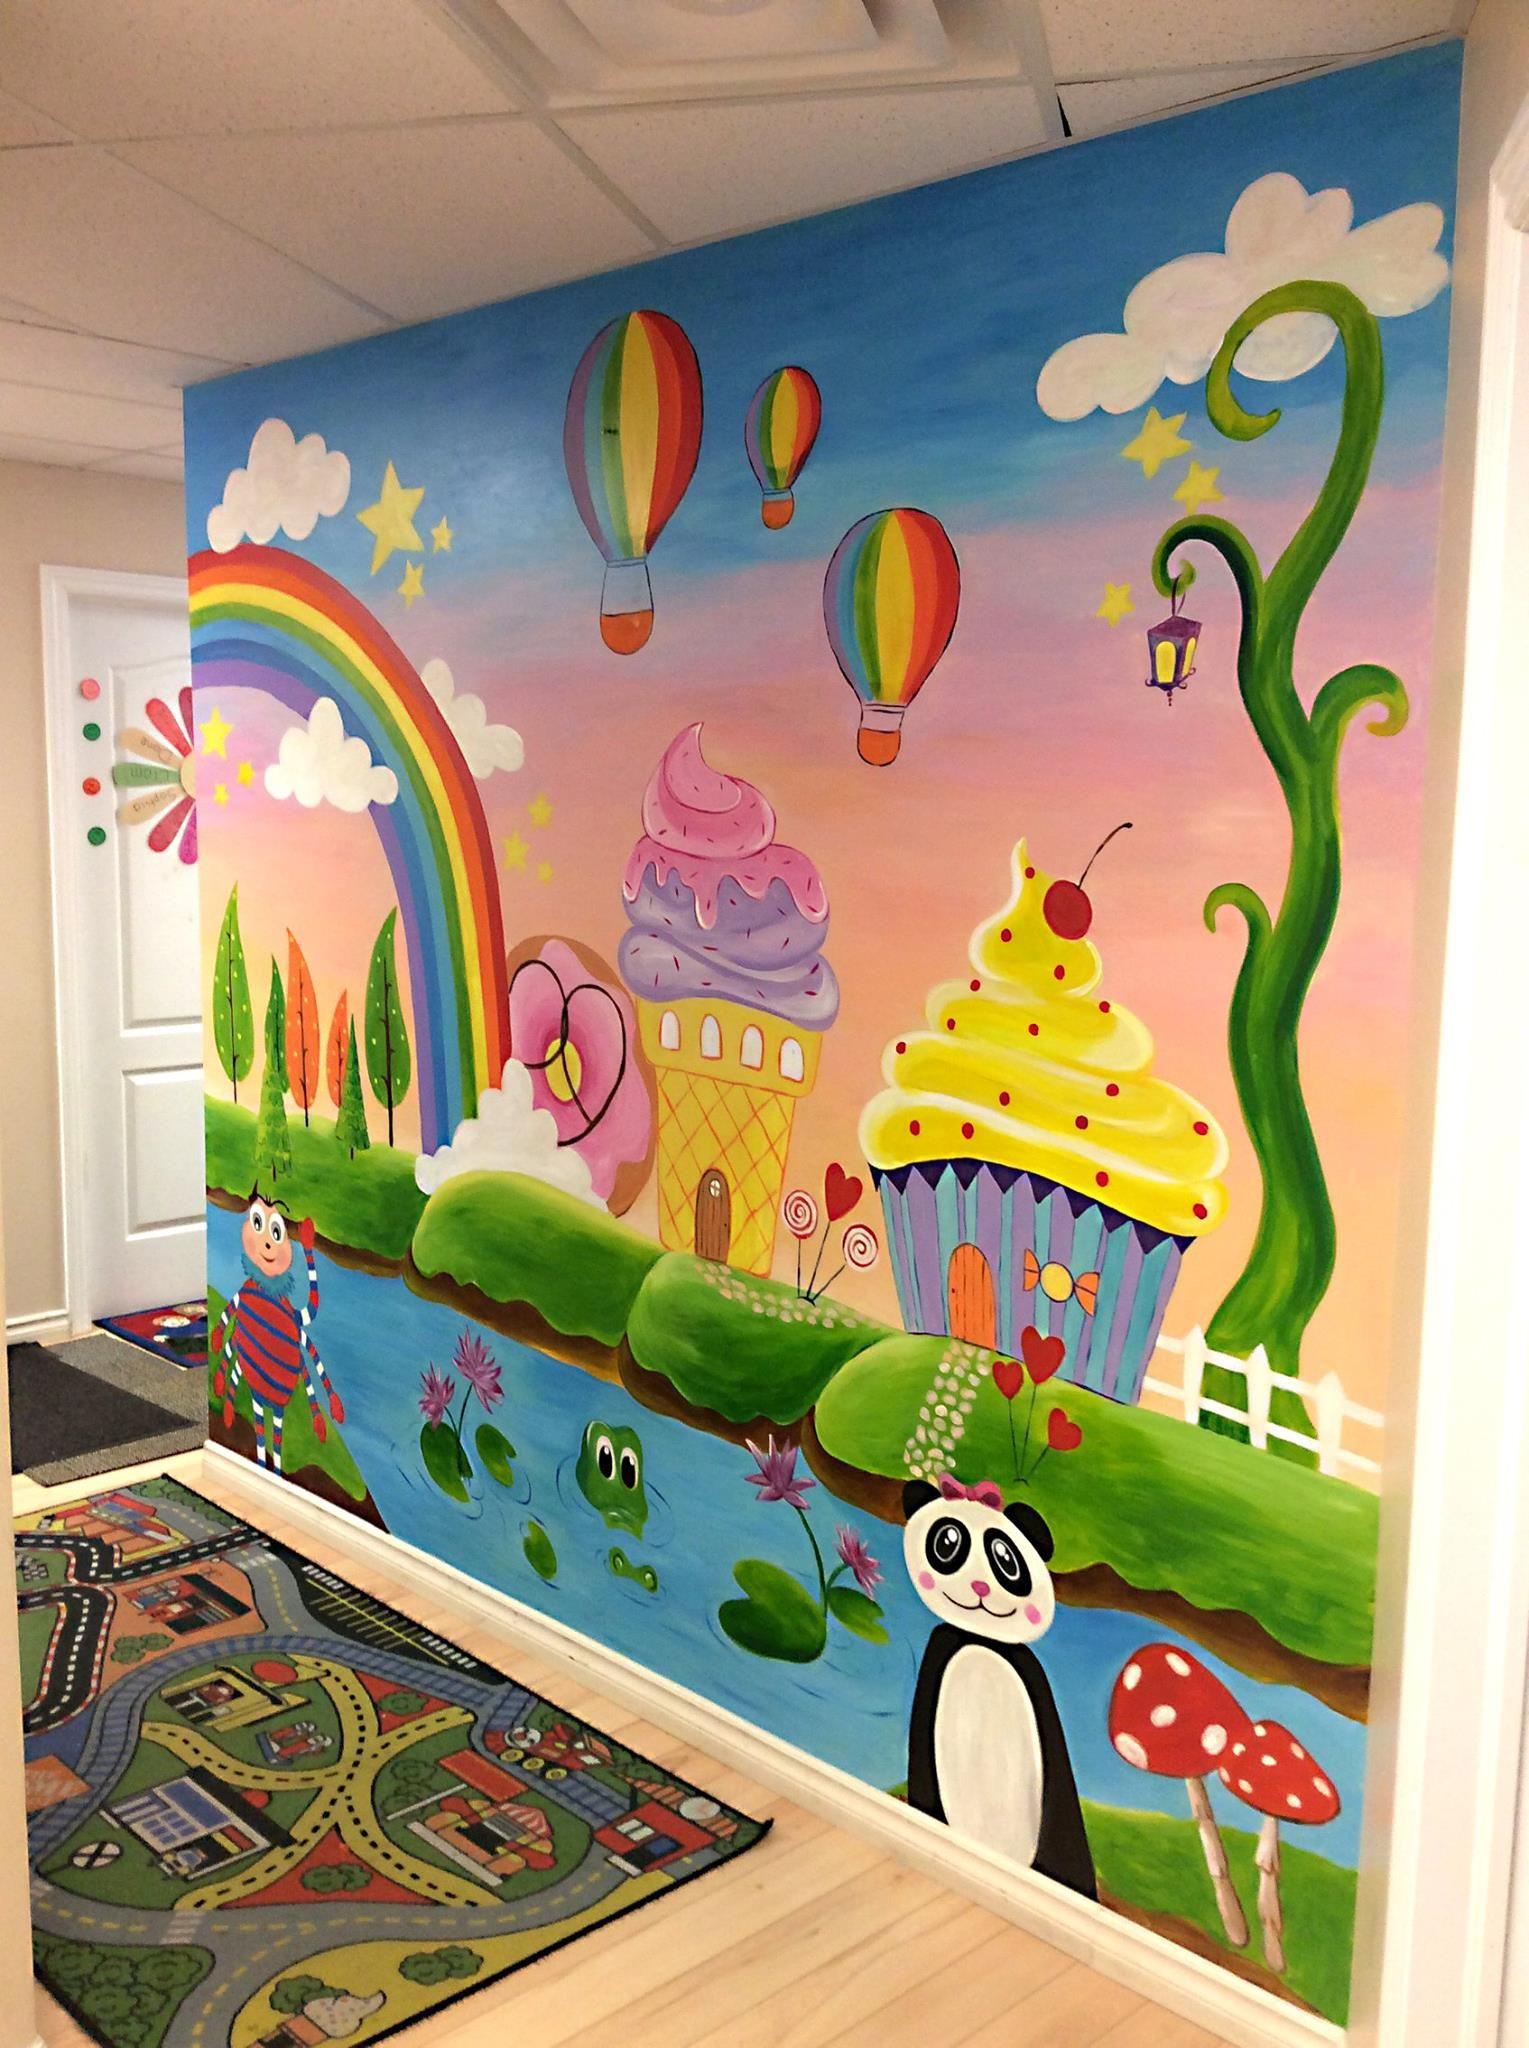 candy land wall murals Colour Inspireds ideas for wall murals